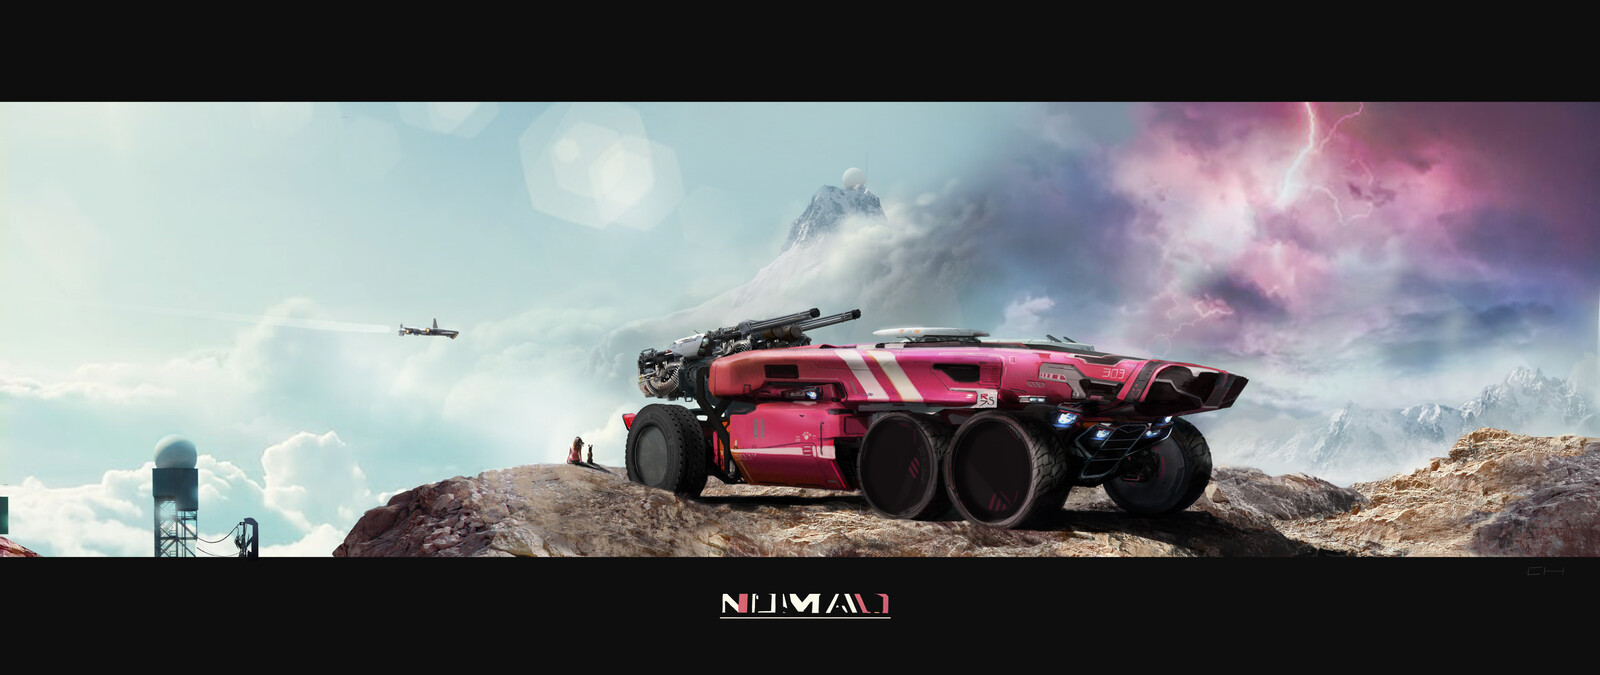 Nomad 3